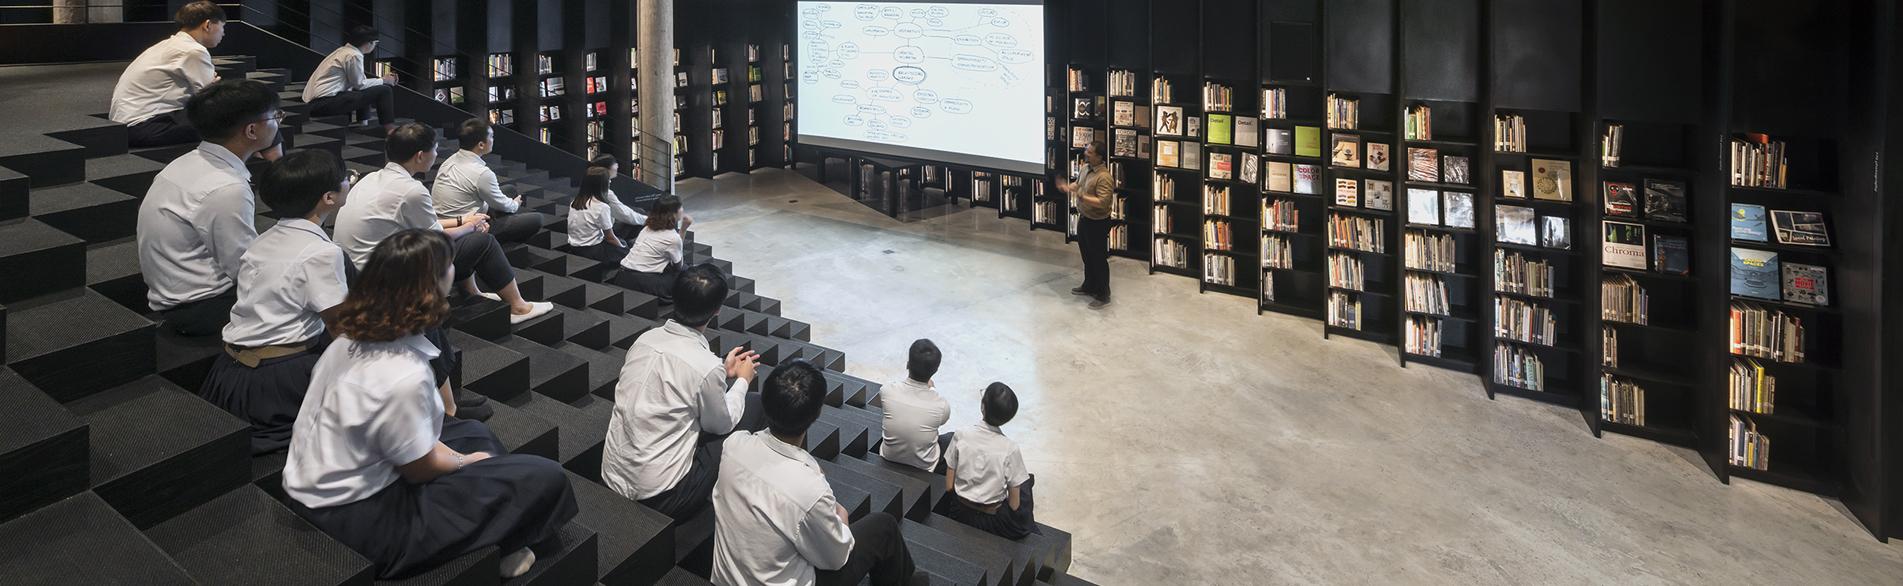 Chulalongkorn University, Thailand - Gallery (2)